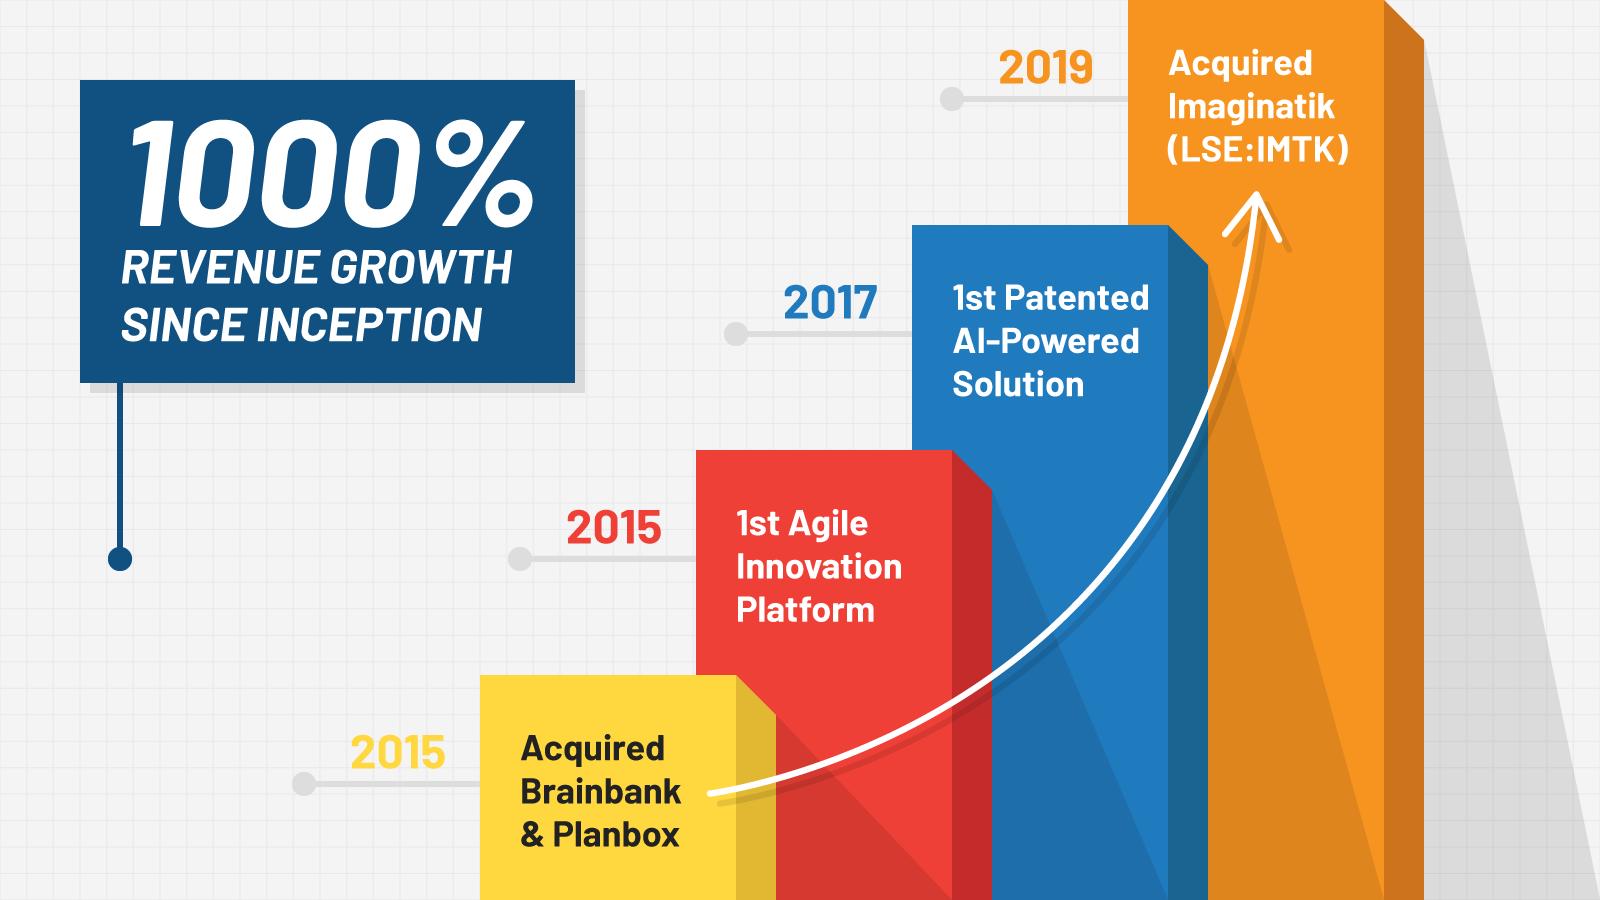 1000% revenue growth